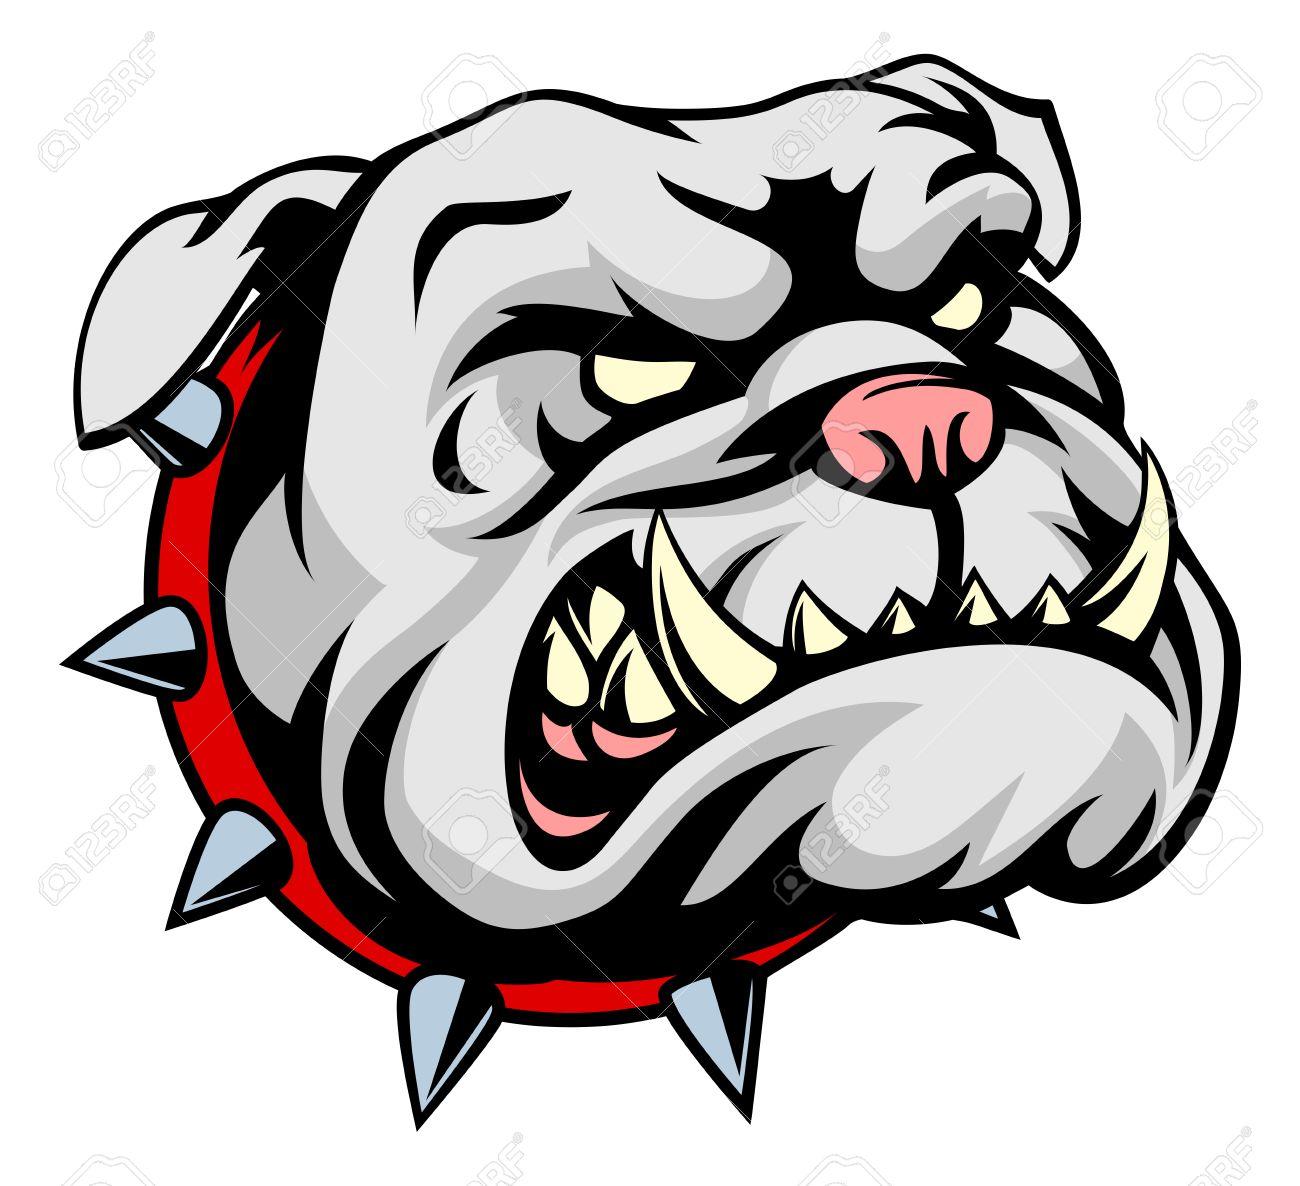 1300x1186 A Mean Looking Cartoon Pet Bulldog Dog Wearing A Spiked Collar